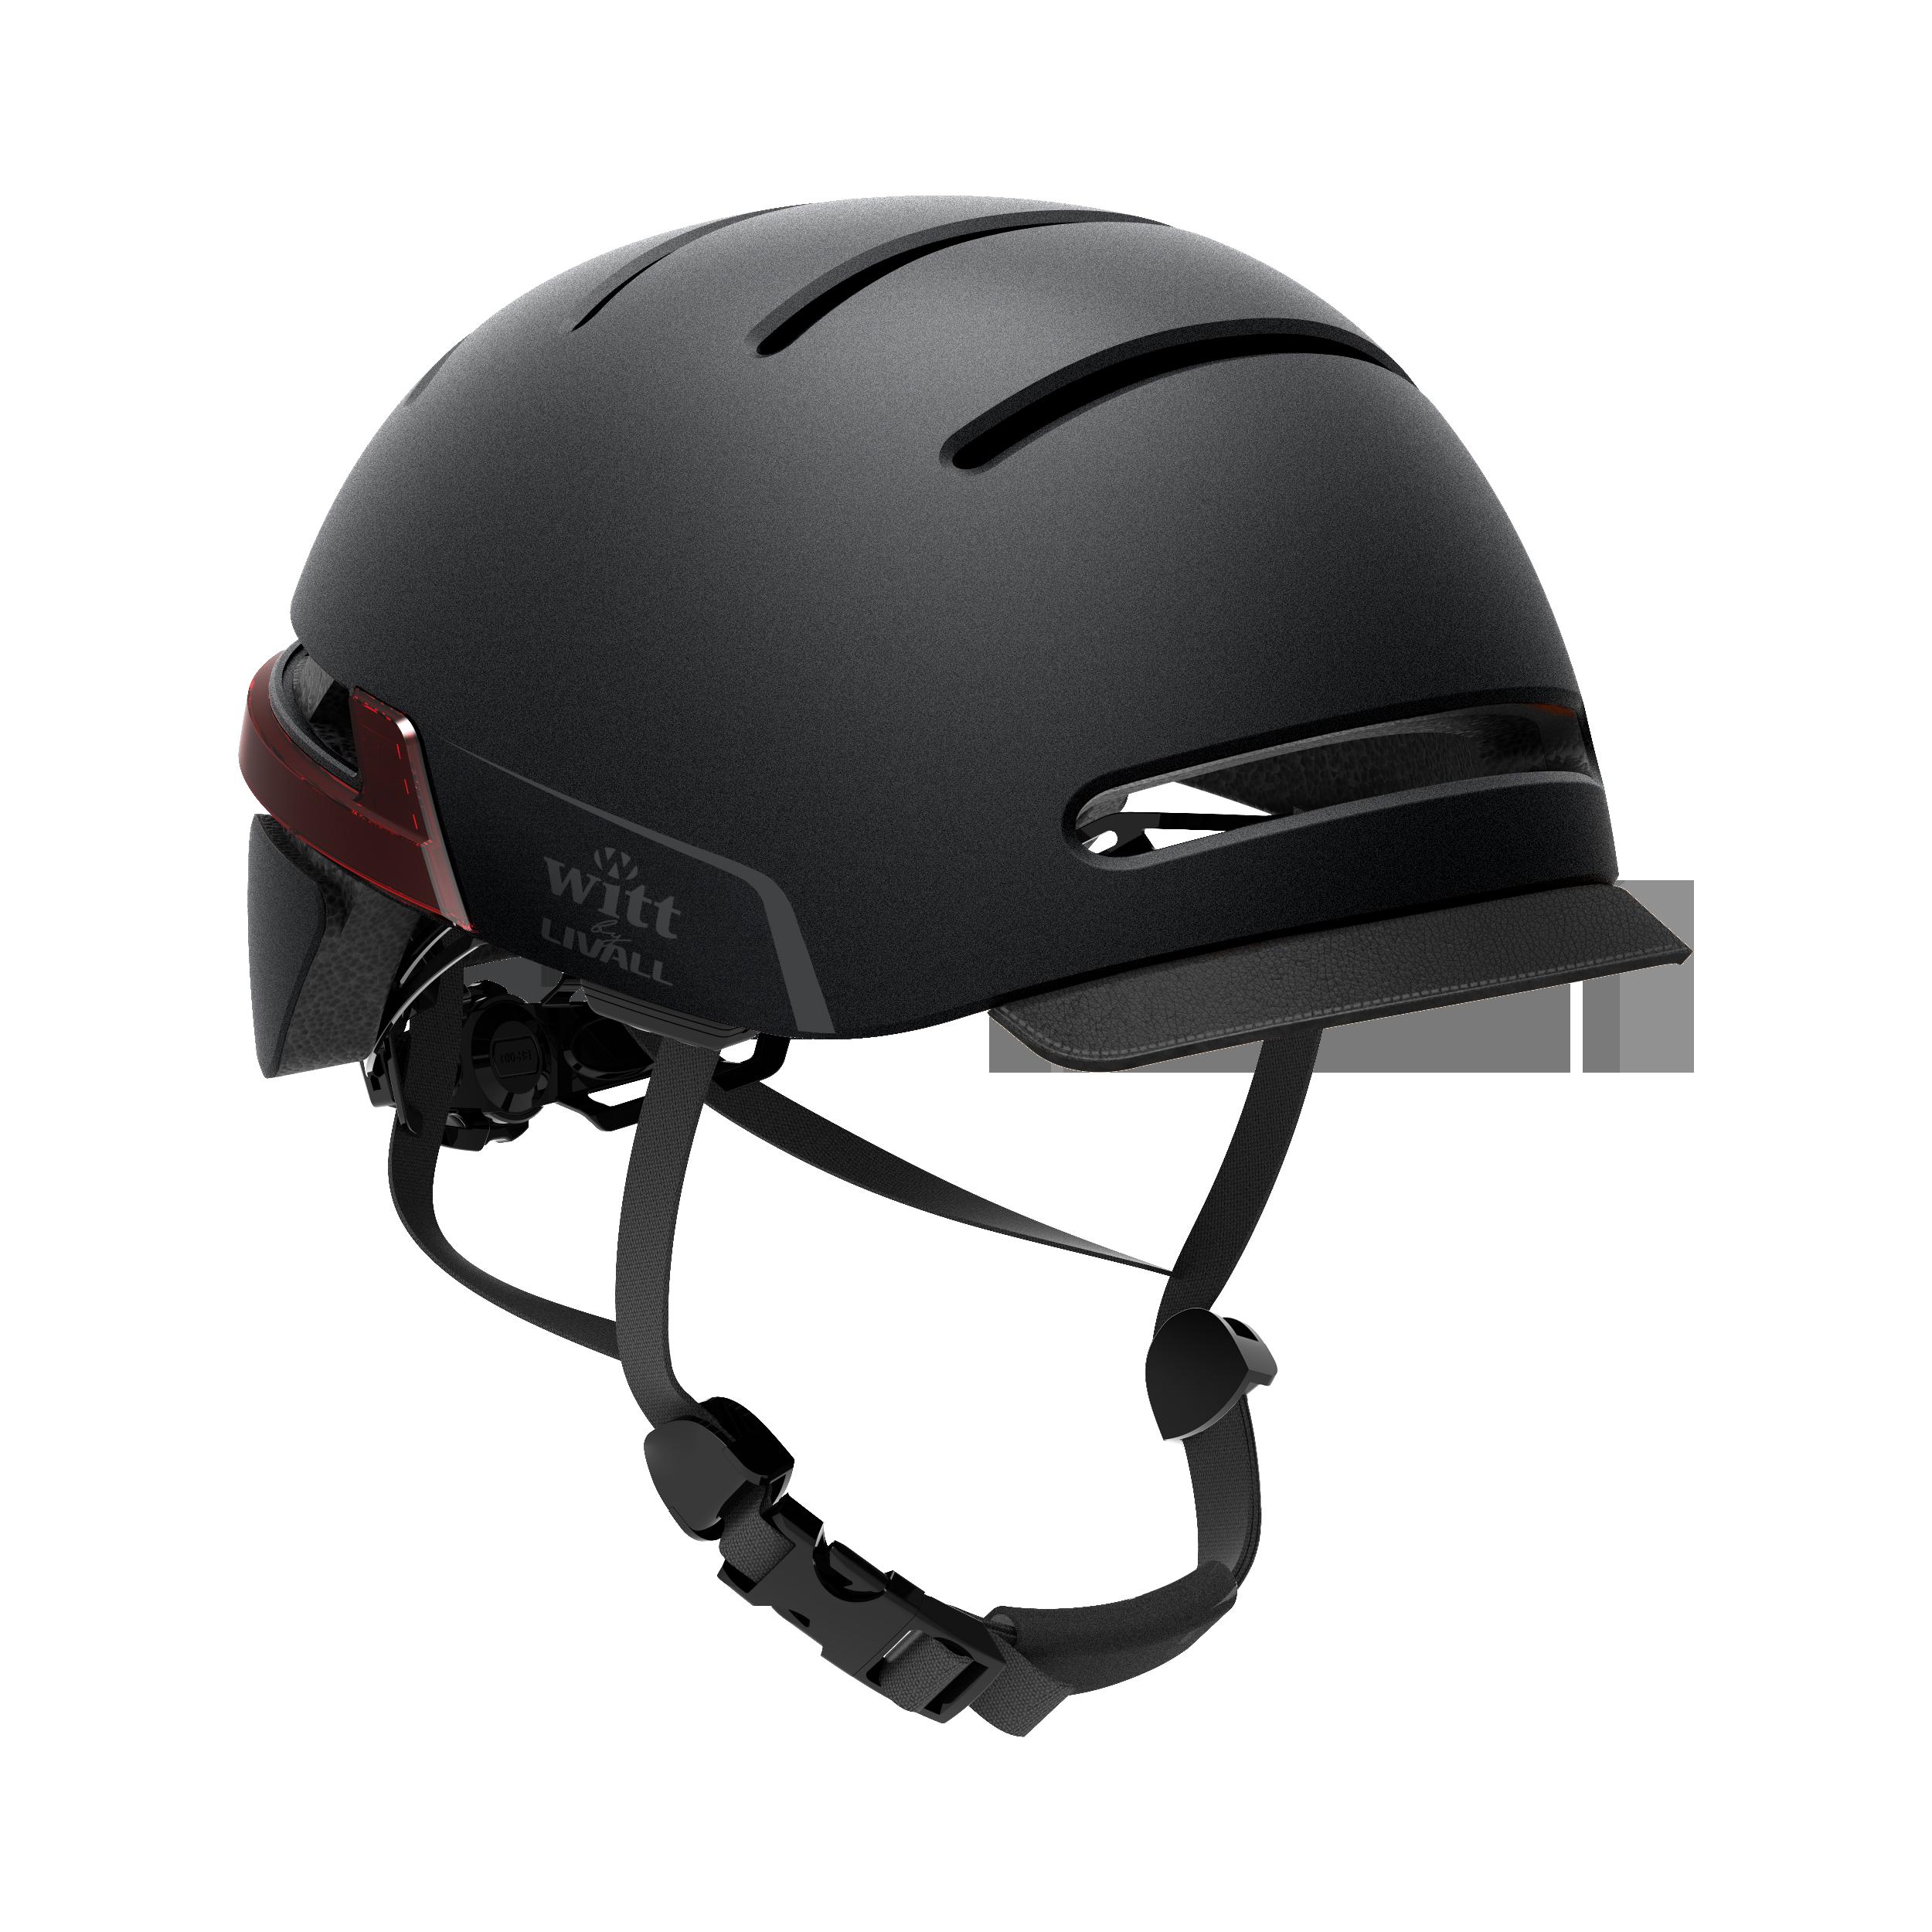 Witt by Livall - Smart Standard Helmet